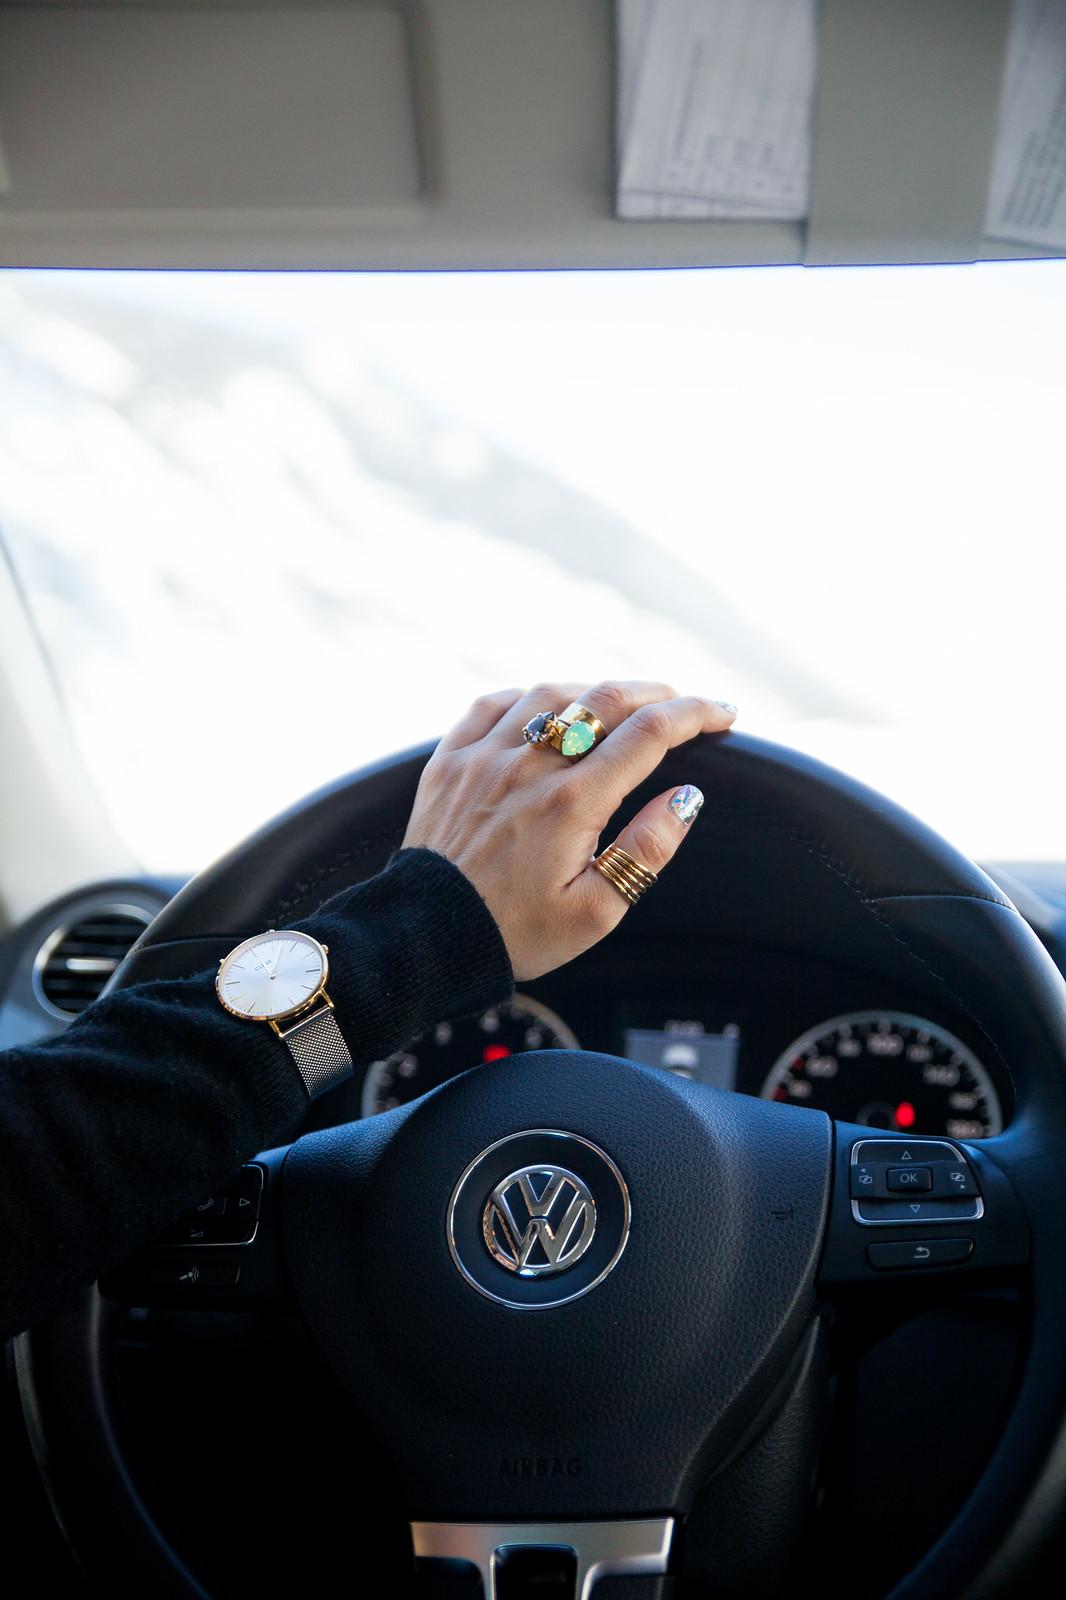 DRIVY LA APP PARA ALQUILAR COCHES ENTRE PARTICULARES theguestgirl cluse caroline svedbom sweeden influencer barcelona nails art uñas holograficas barcelona blogger de coches de lujo